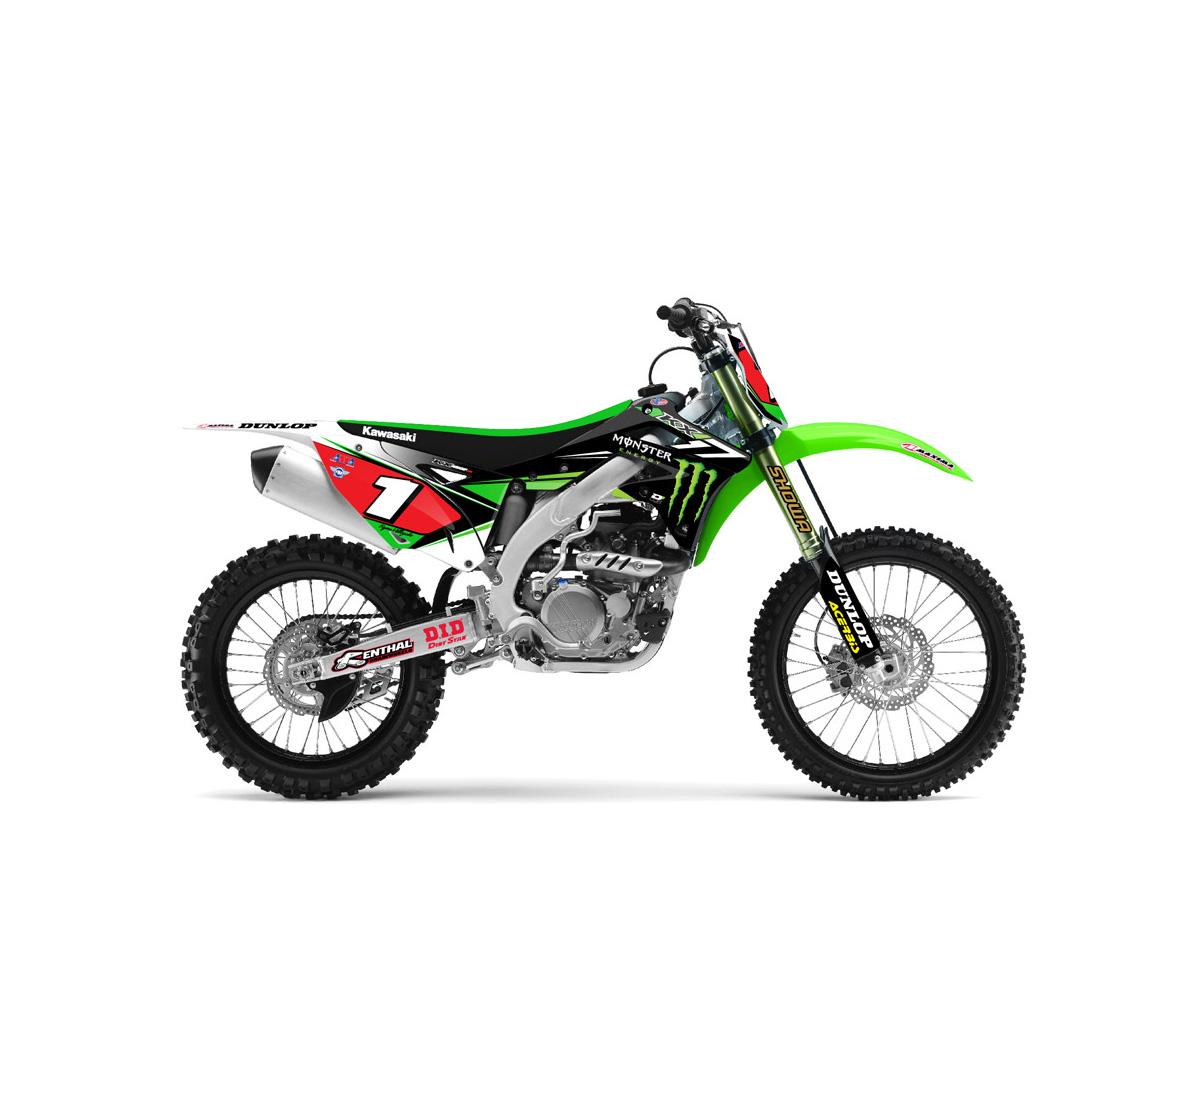 Motorcycle Graphic Kit - 2014 Team Monster Energy® Kawasaki